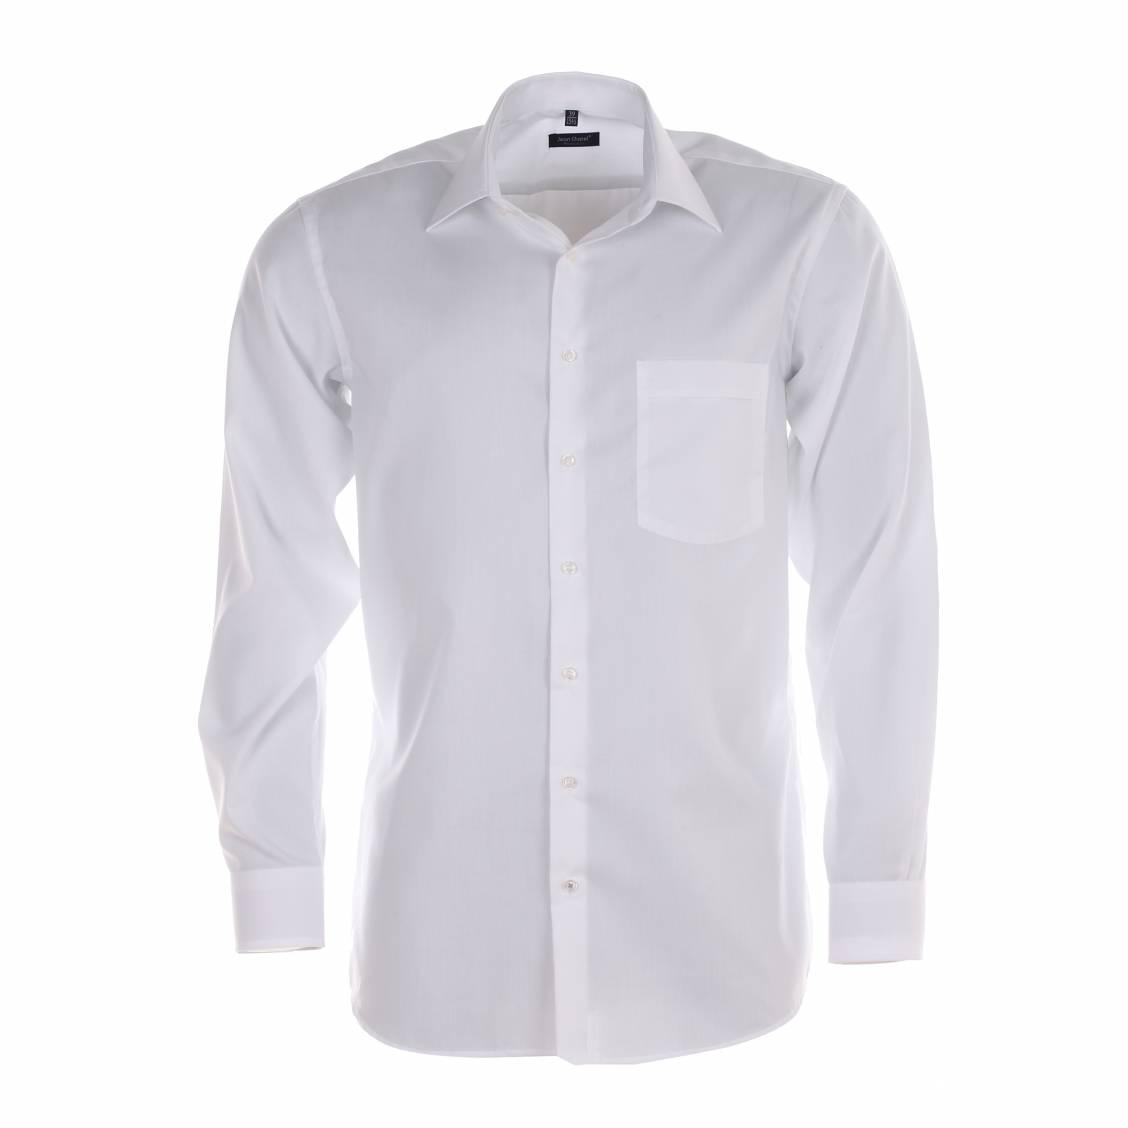 chemise homme sans repassage chambray blanche rue des hommes. Black Bedroom Furniture Sets. Home Design Ideas